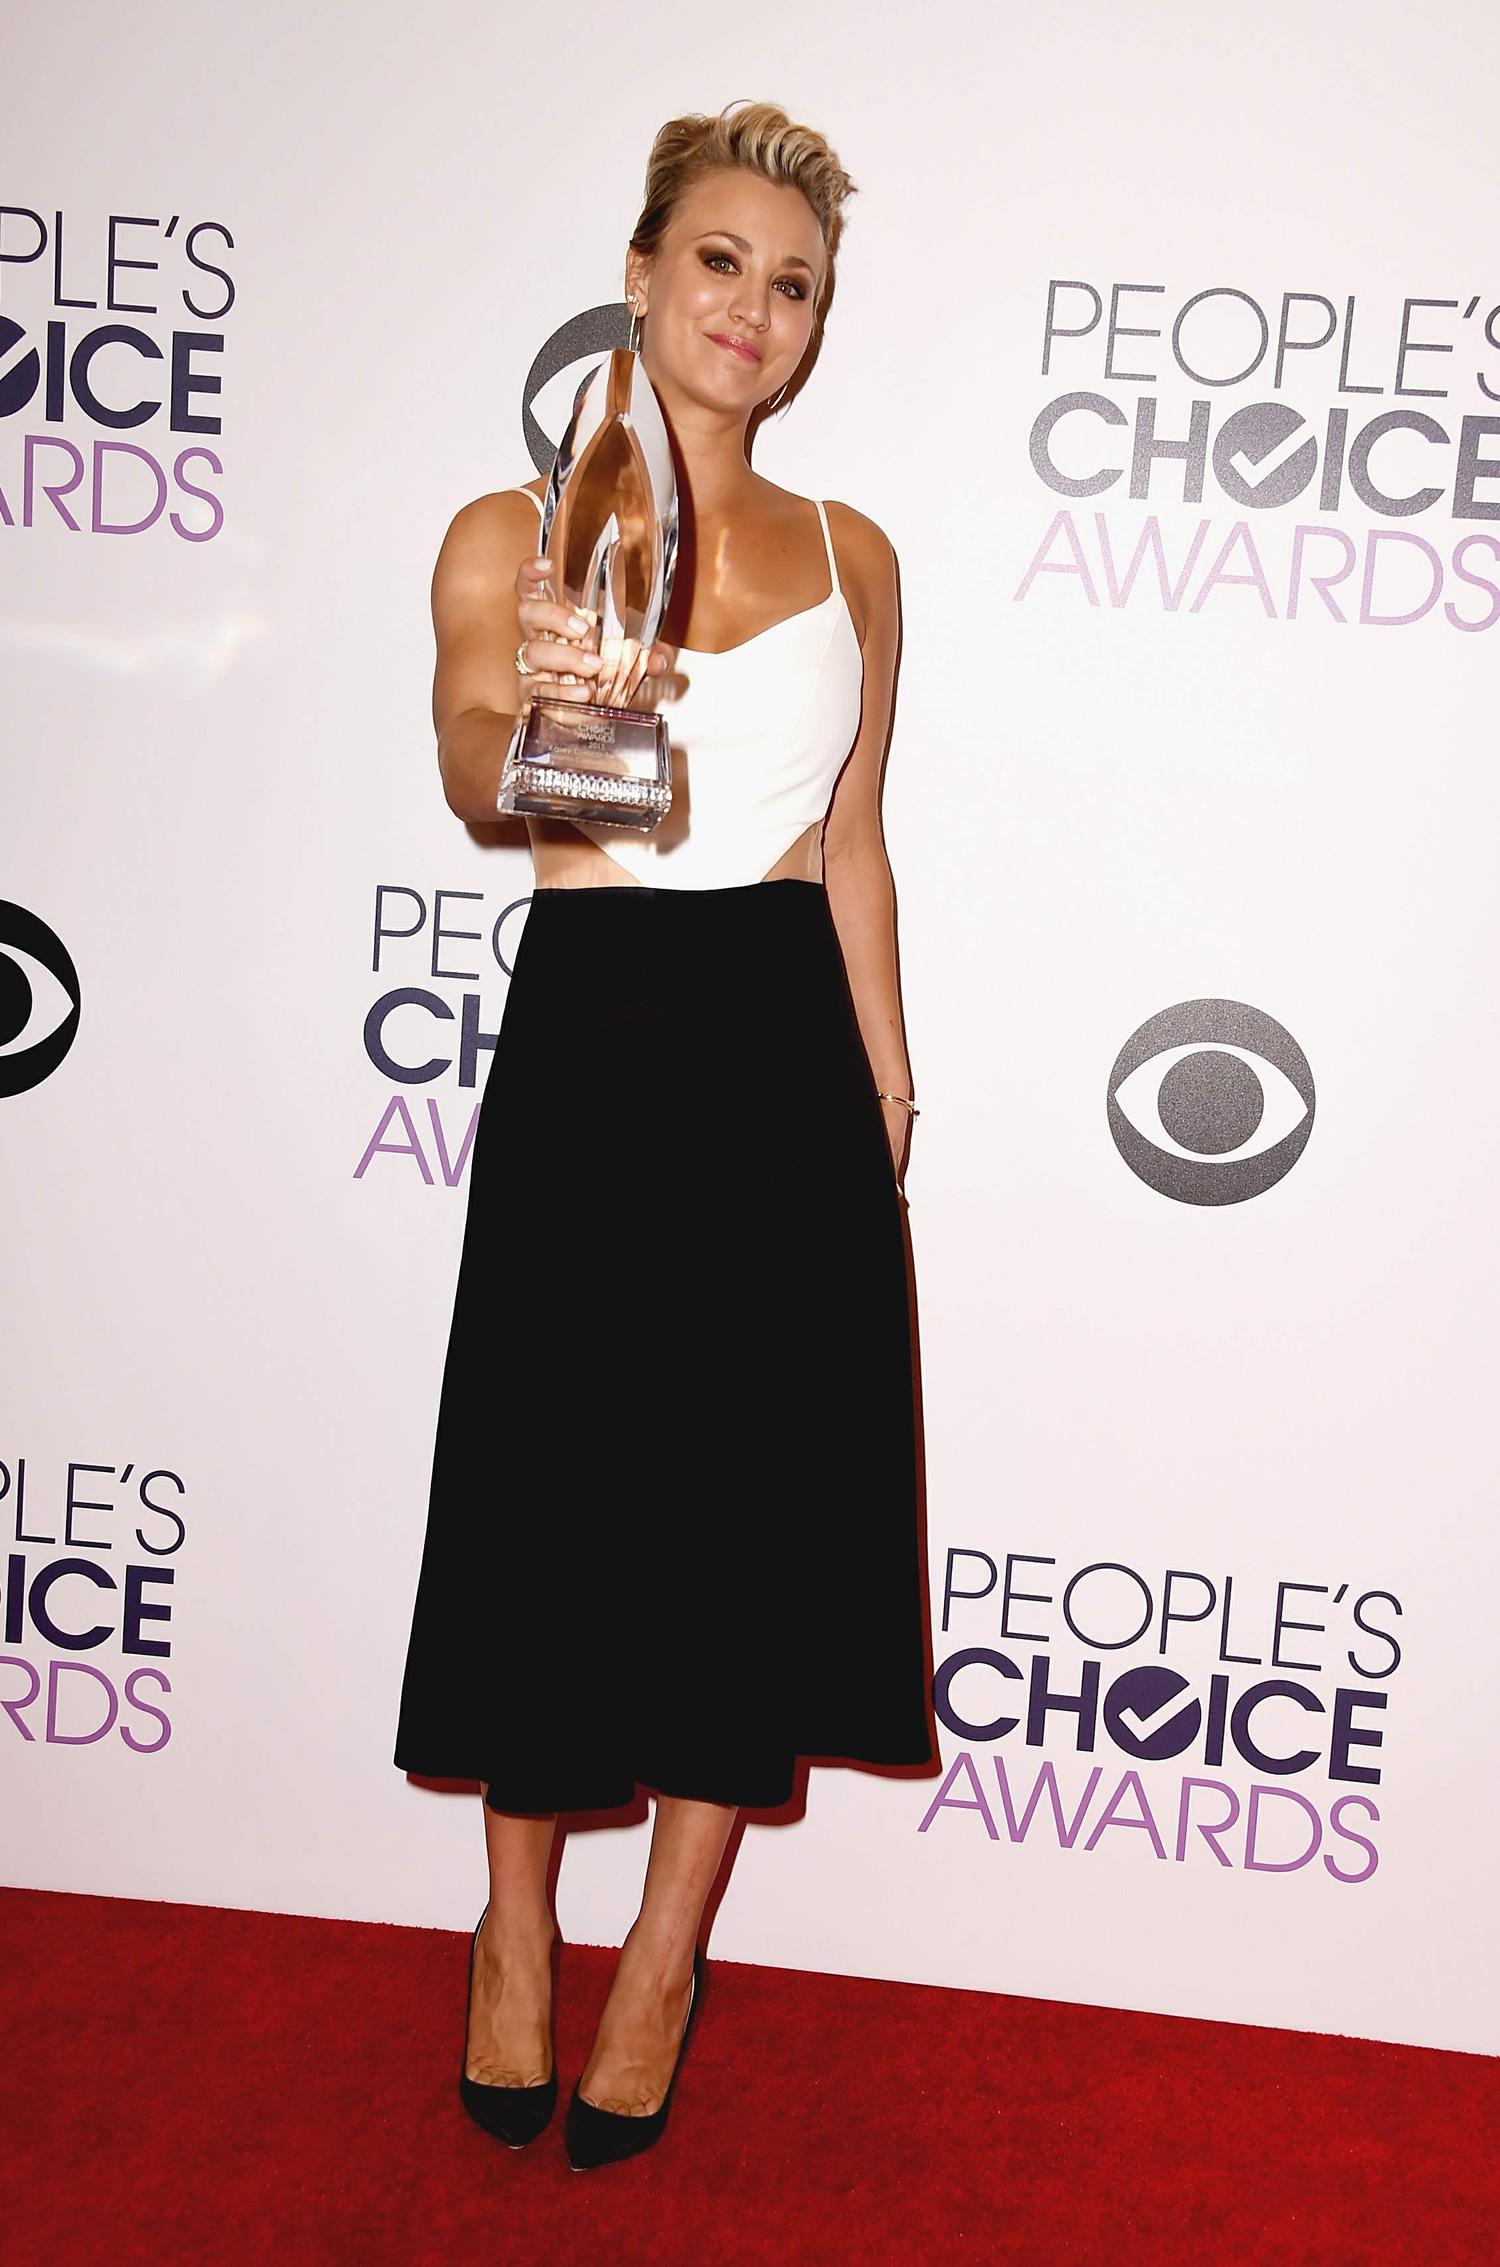 bella-thorne-giorgio-armani-2014-peoples-choice-awards